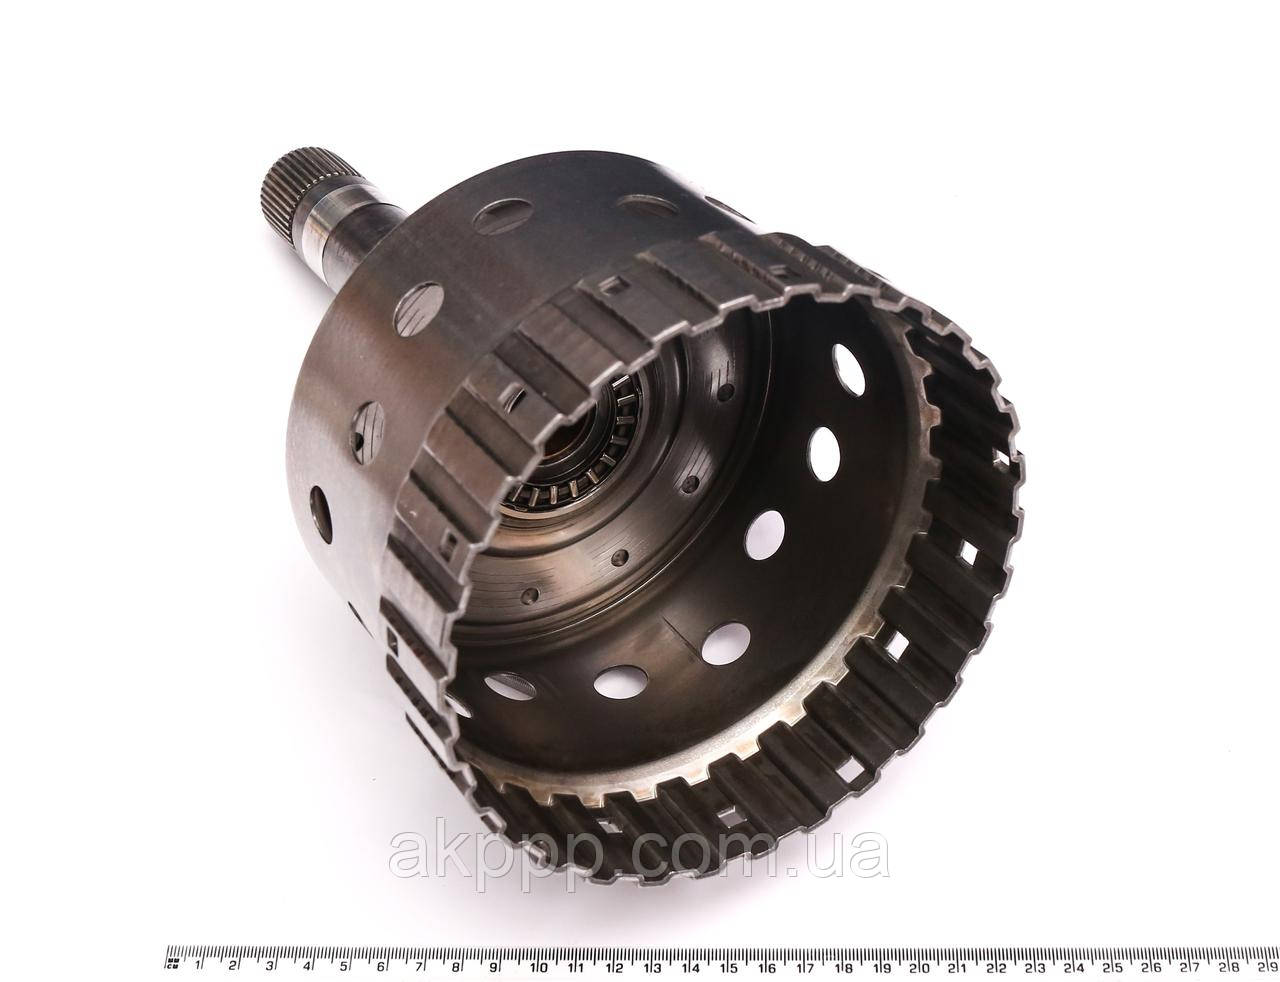 Железо акпп ZF6HP26